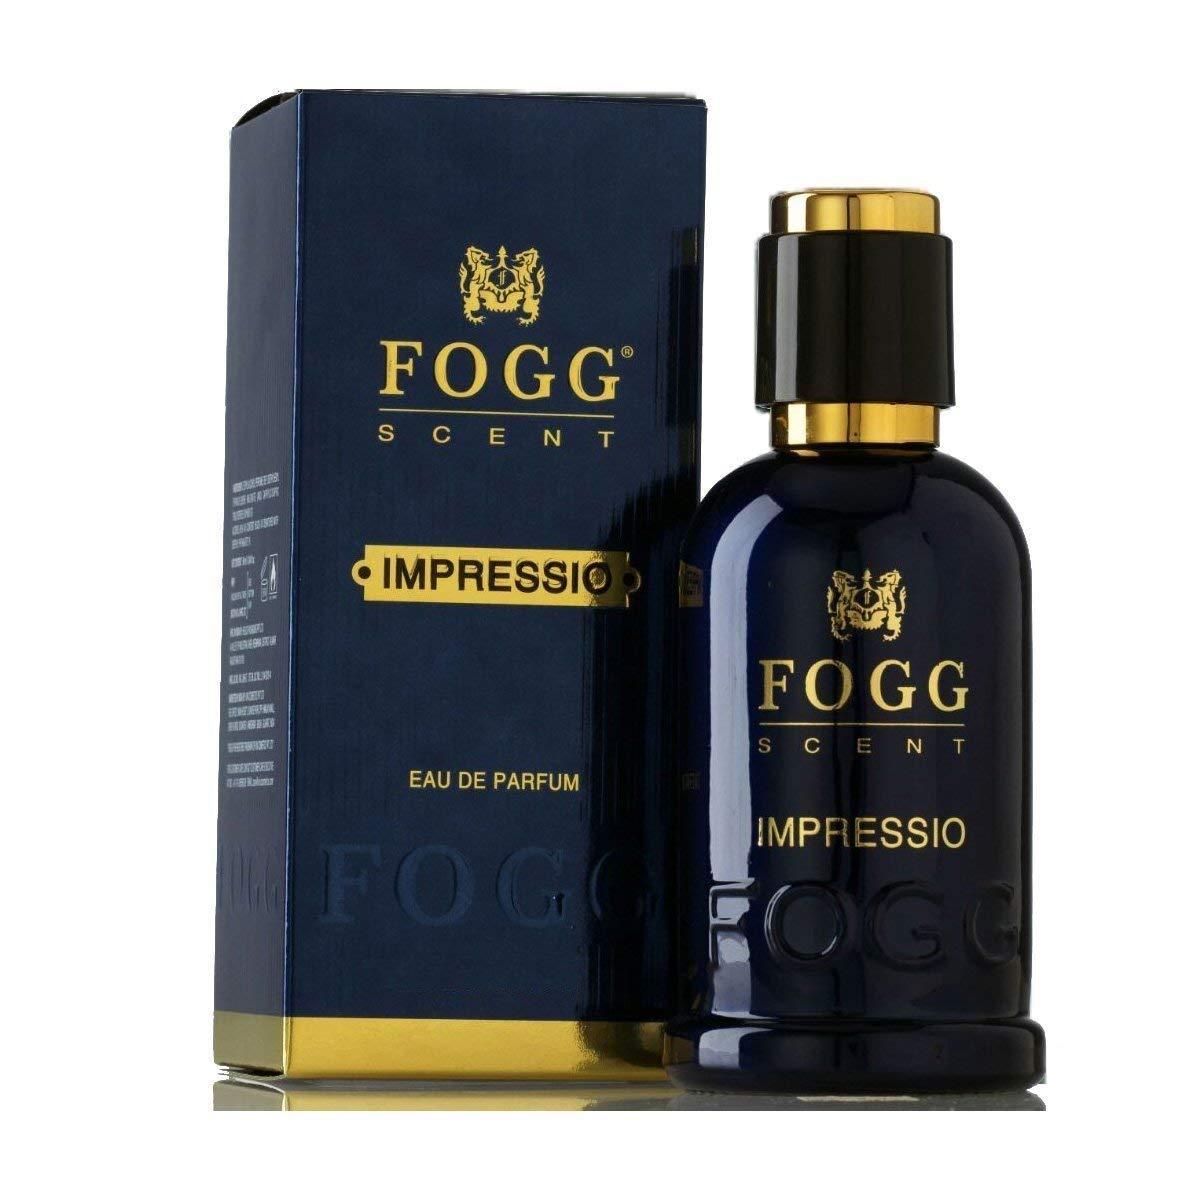 Fogg Impressio Scent